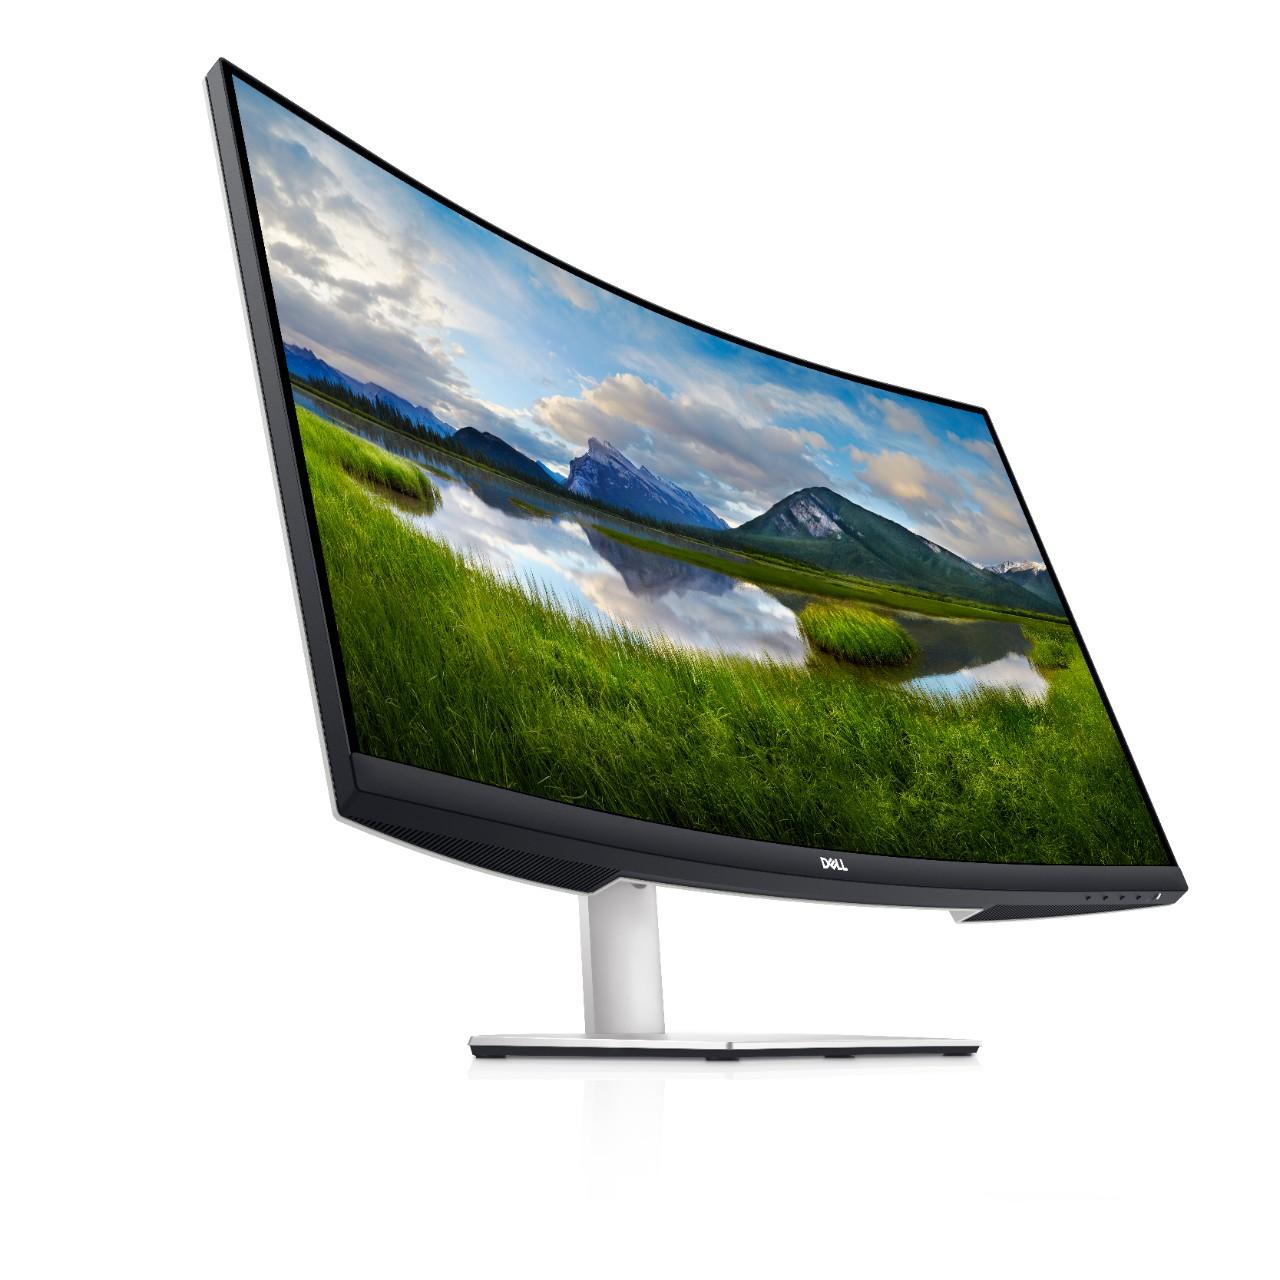 32'' LED Dell S3221QS 4K UHD 16:9/3000:1/4ms/300cd/HDMI/DP/USB/Repro/VESA/3RNBD prohnutý, 210-AXLH